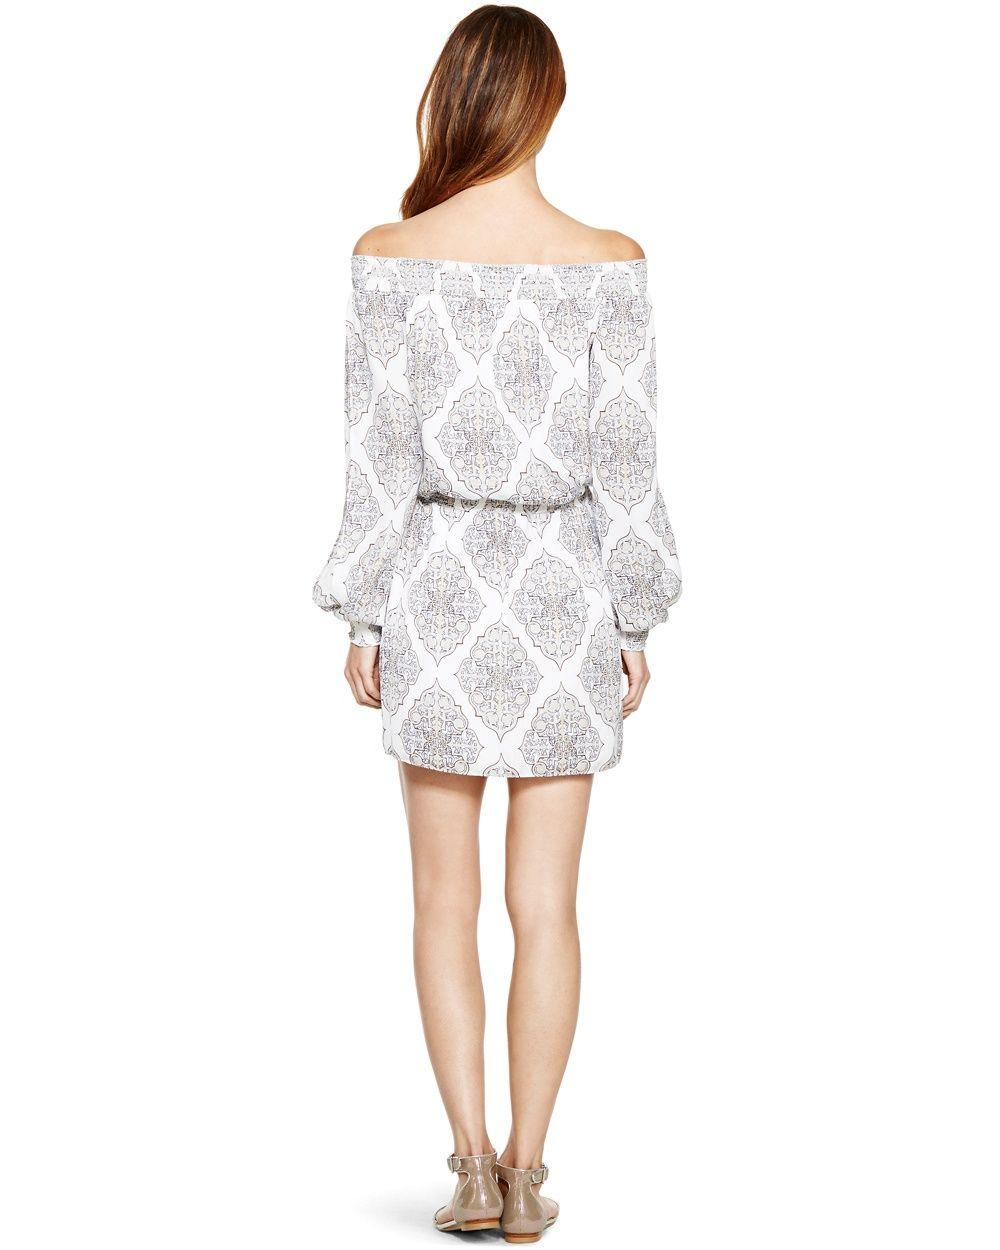 New Arrivals on Dresses & Skirts - Dress Boutique - White House | Black Market